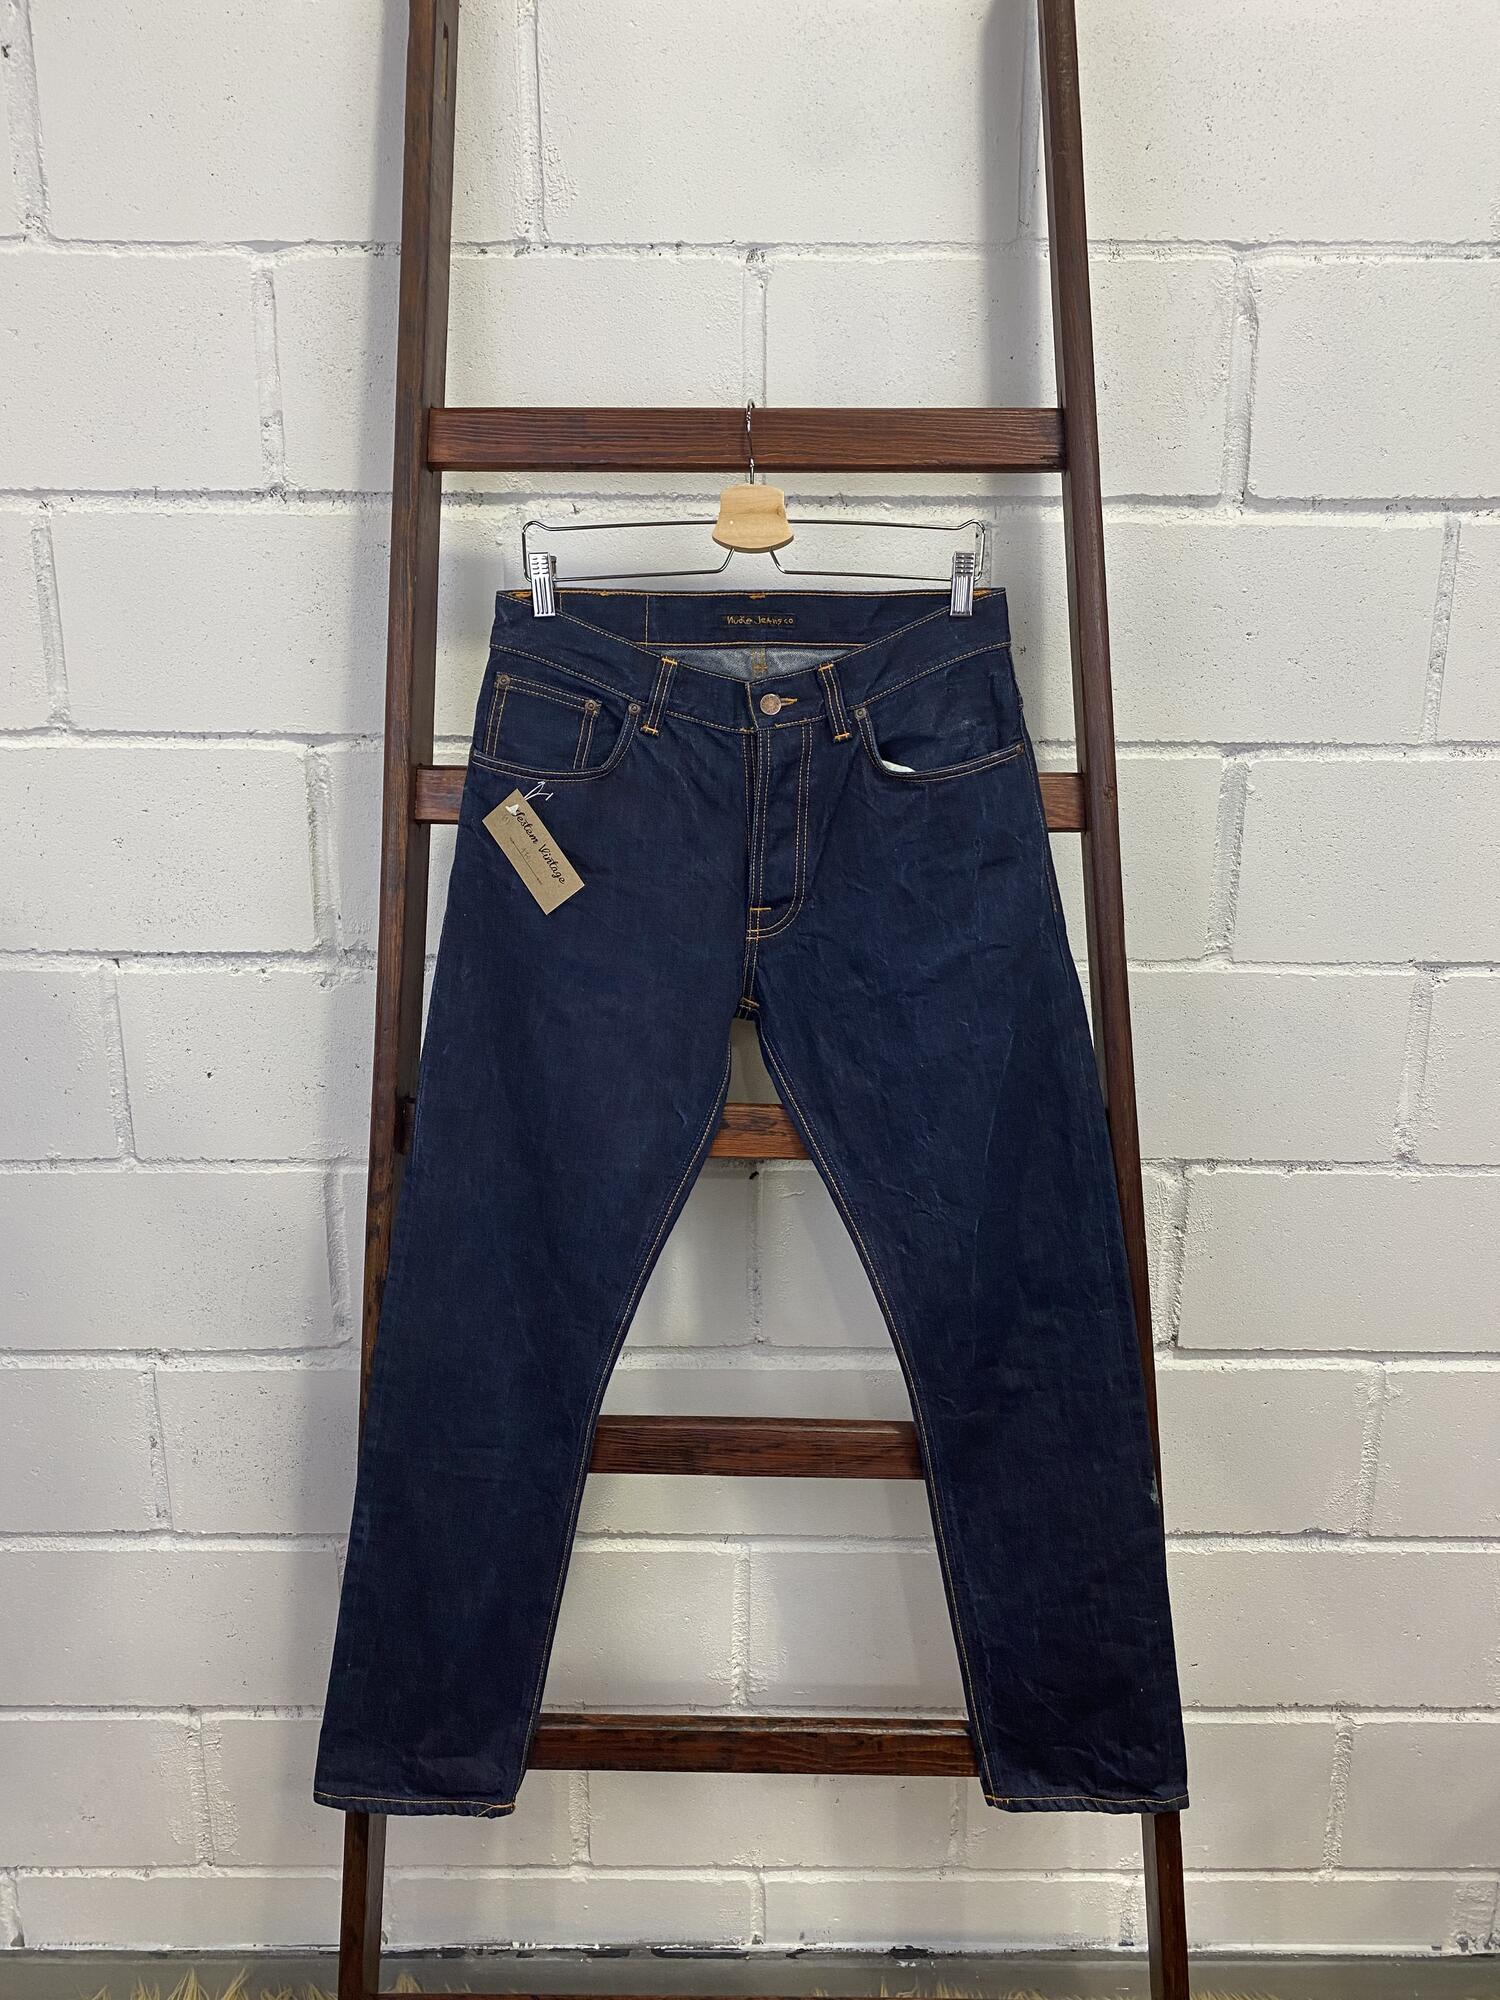 Męskie jeansy NUDIE JEANS - Vintage Store   JestemSlow.pl